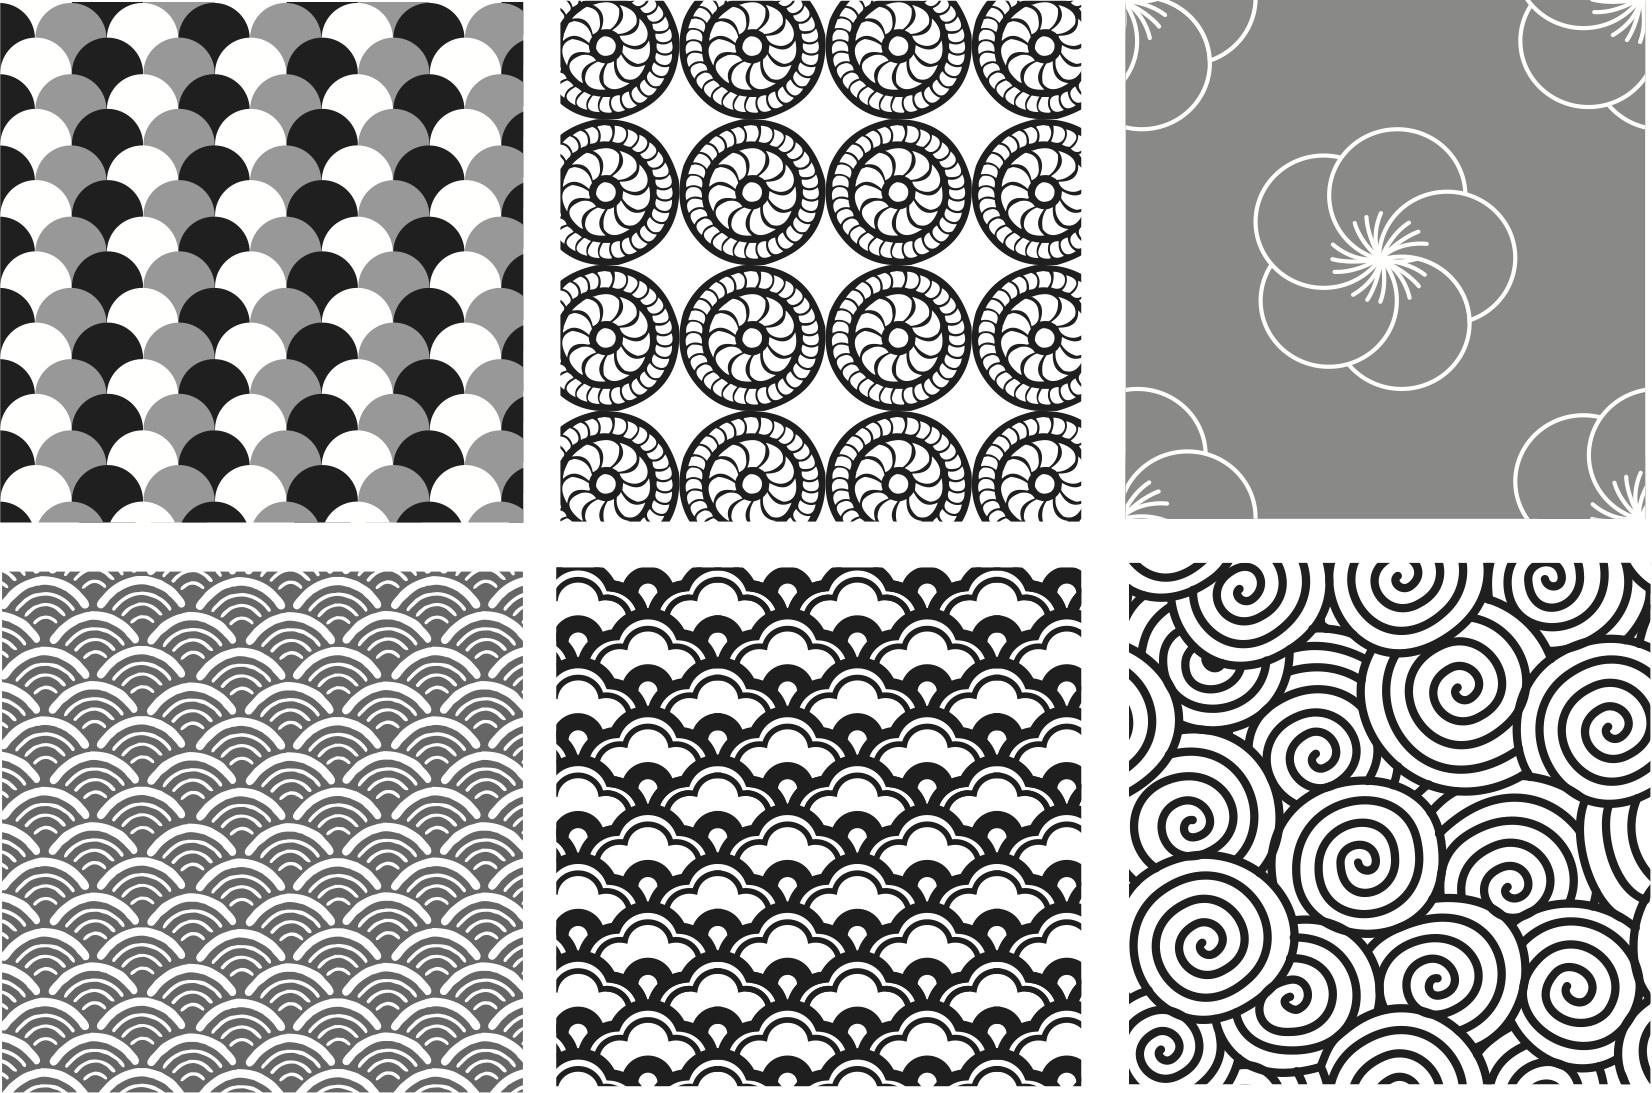 Circles2 Wallpaper